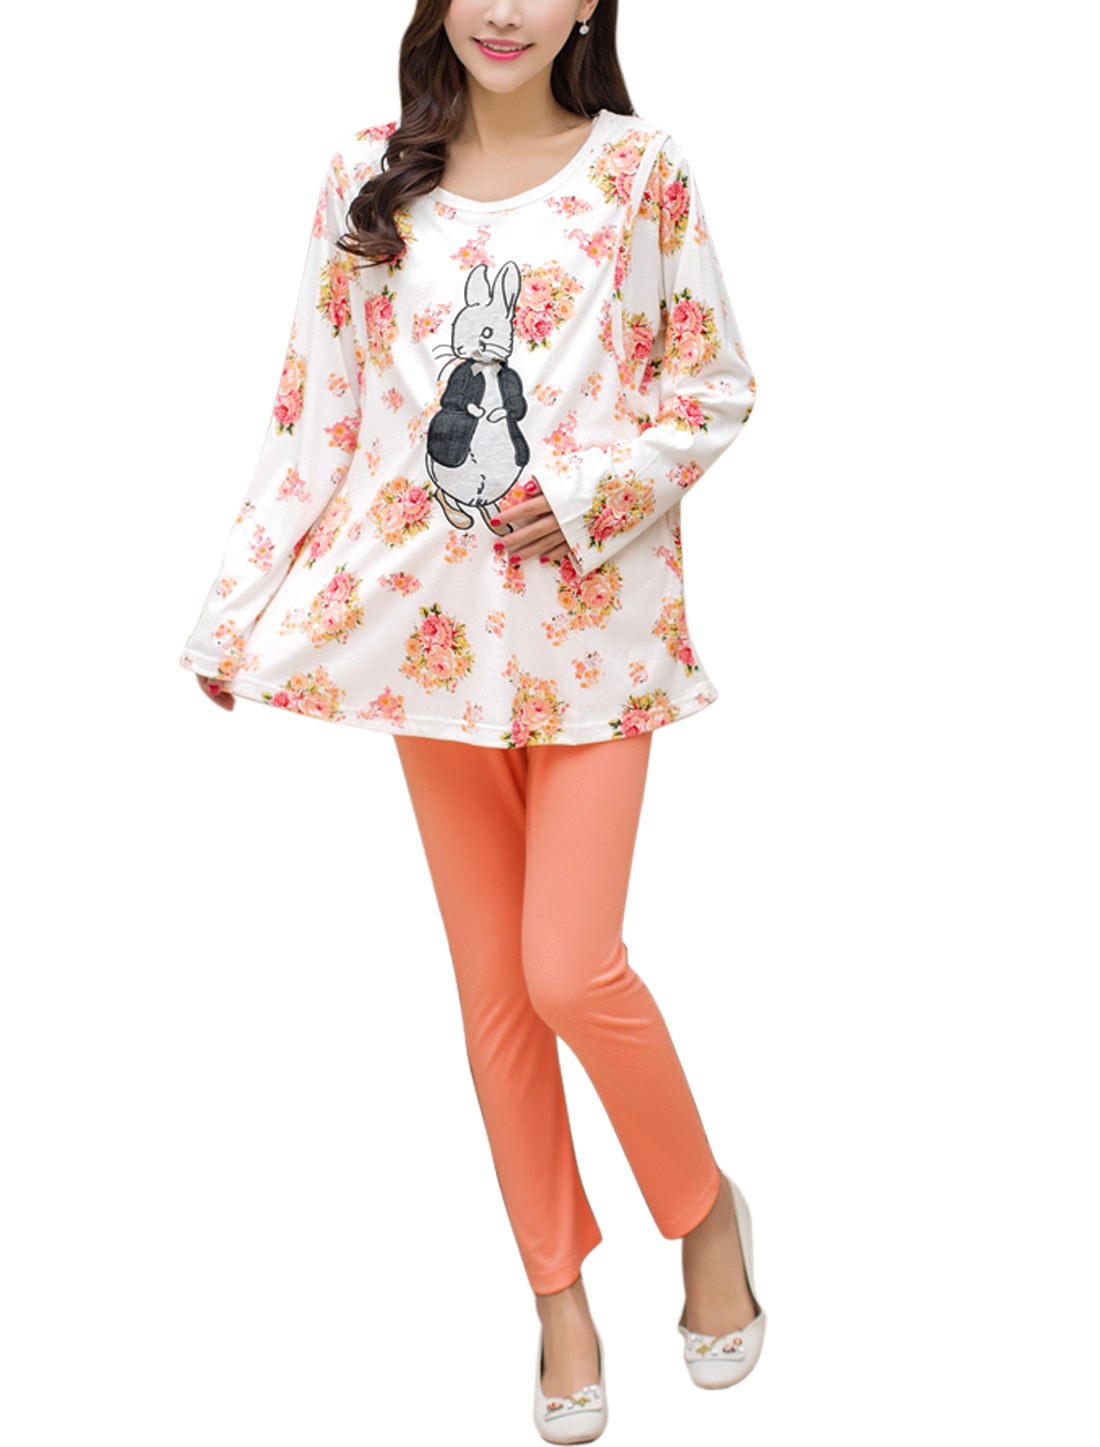 Maternity Floral Layered Top w Skinny Pajama Pants Set White Pink S